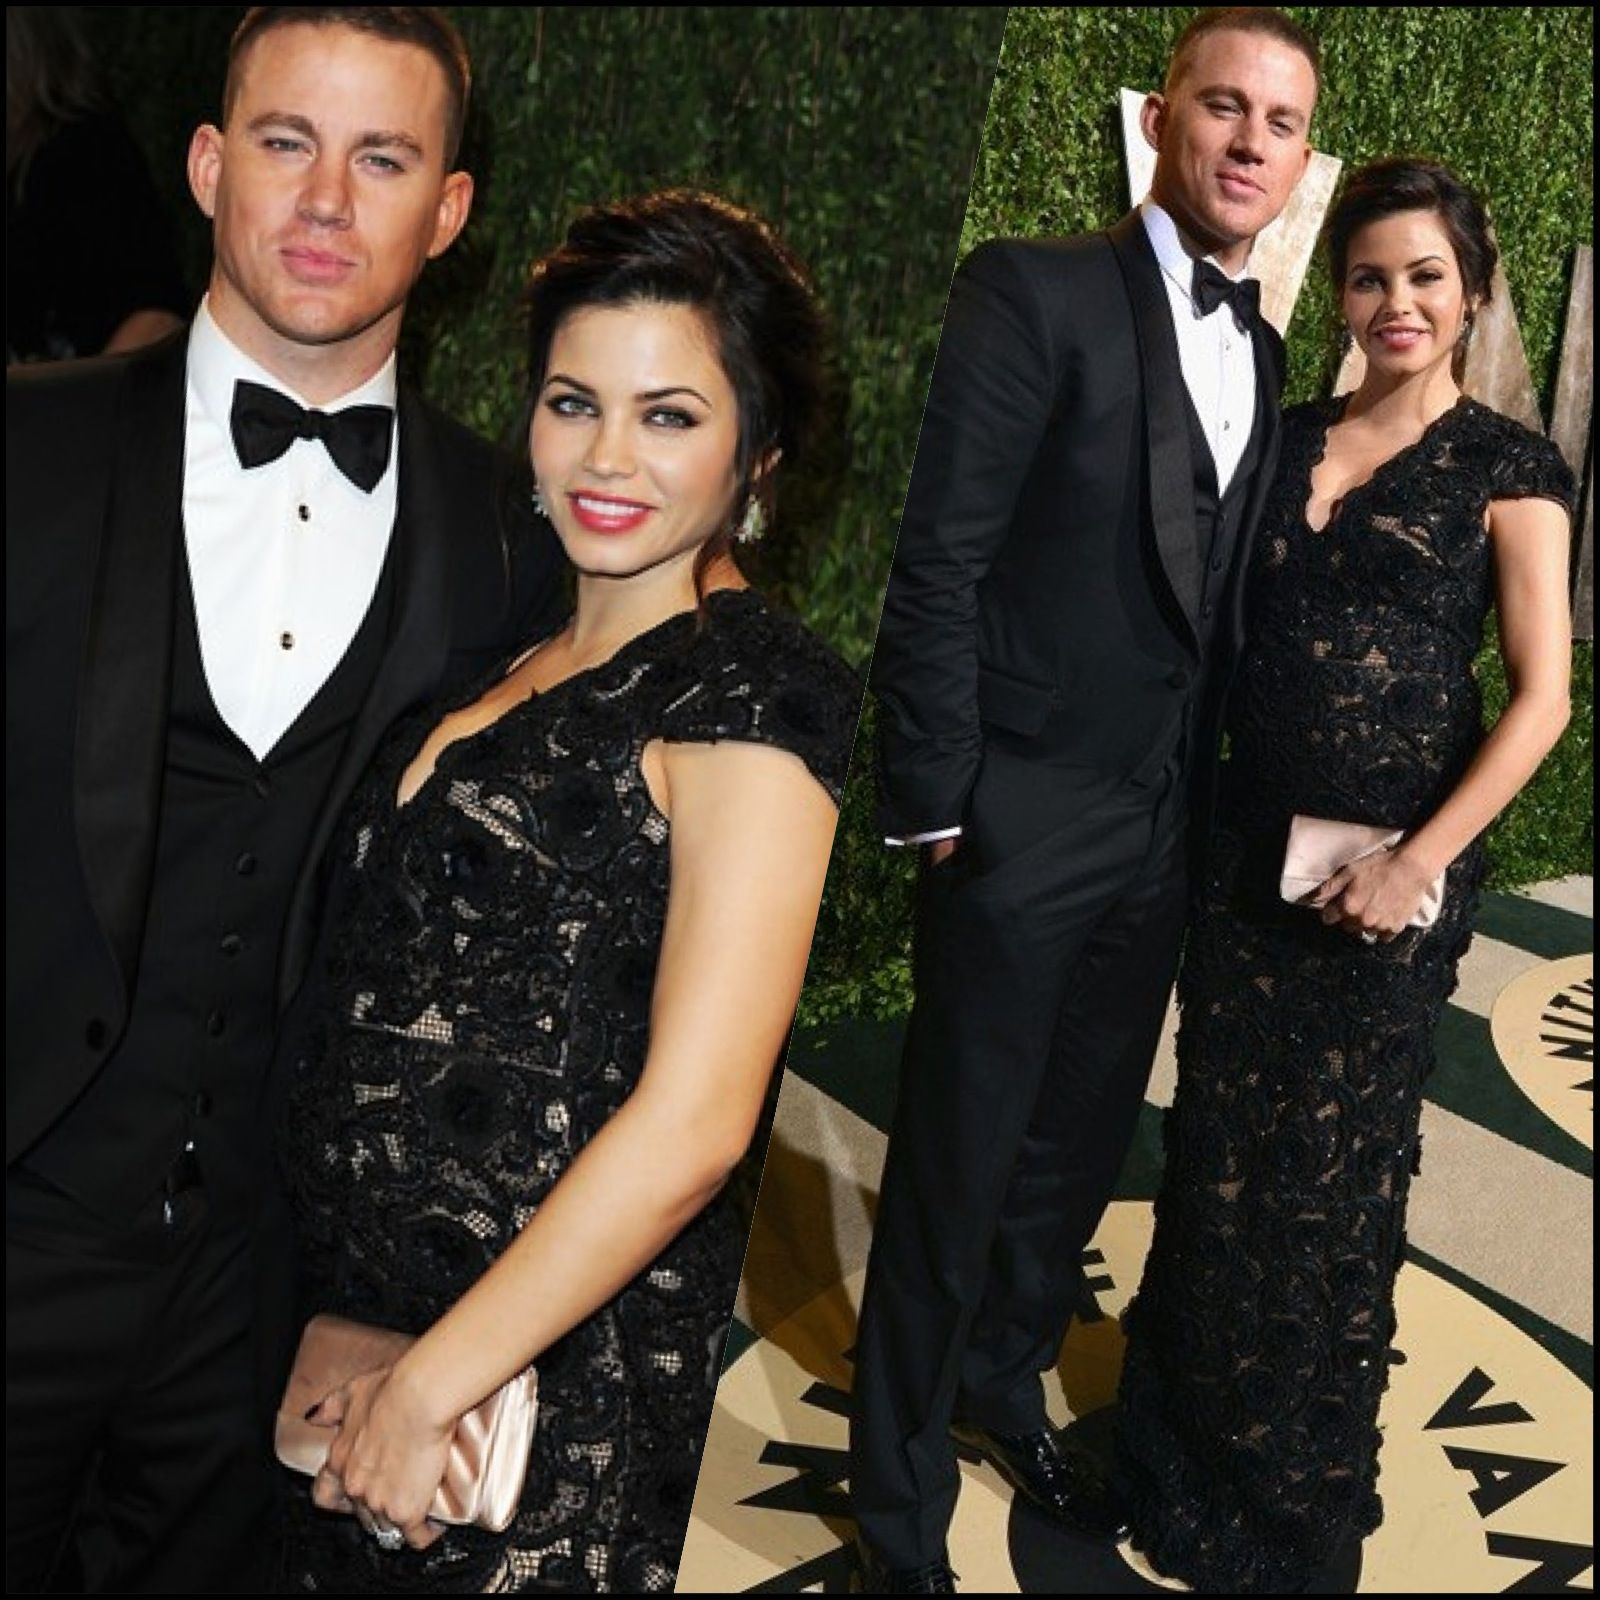 Channing Tatum and Jenna Dewan Tatum at Vanity Fair s Oscars party